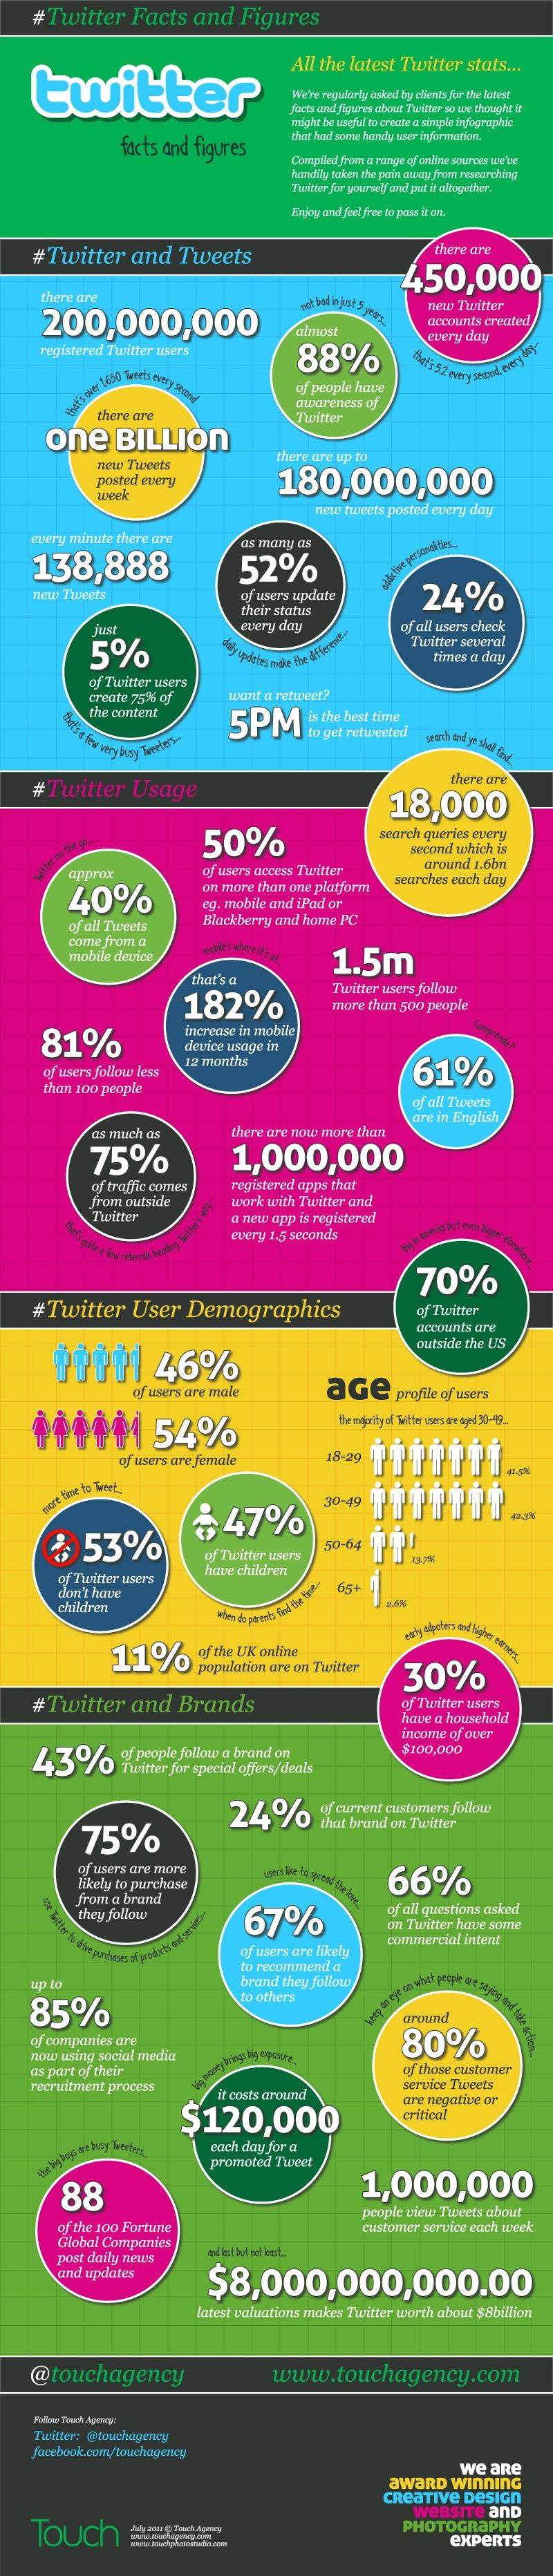 twitter ingorahpei statistiques